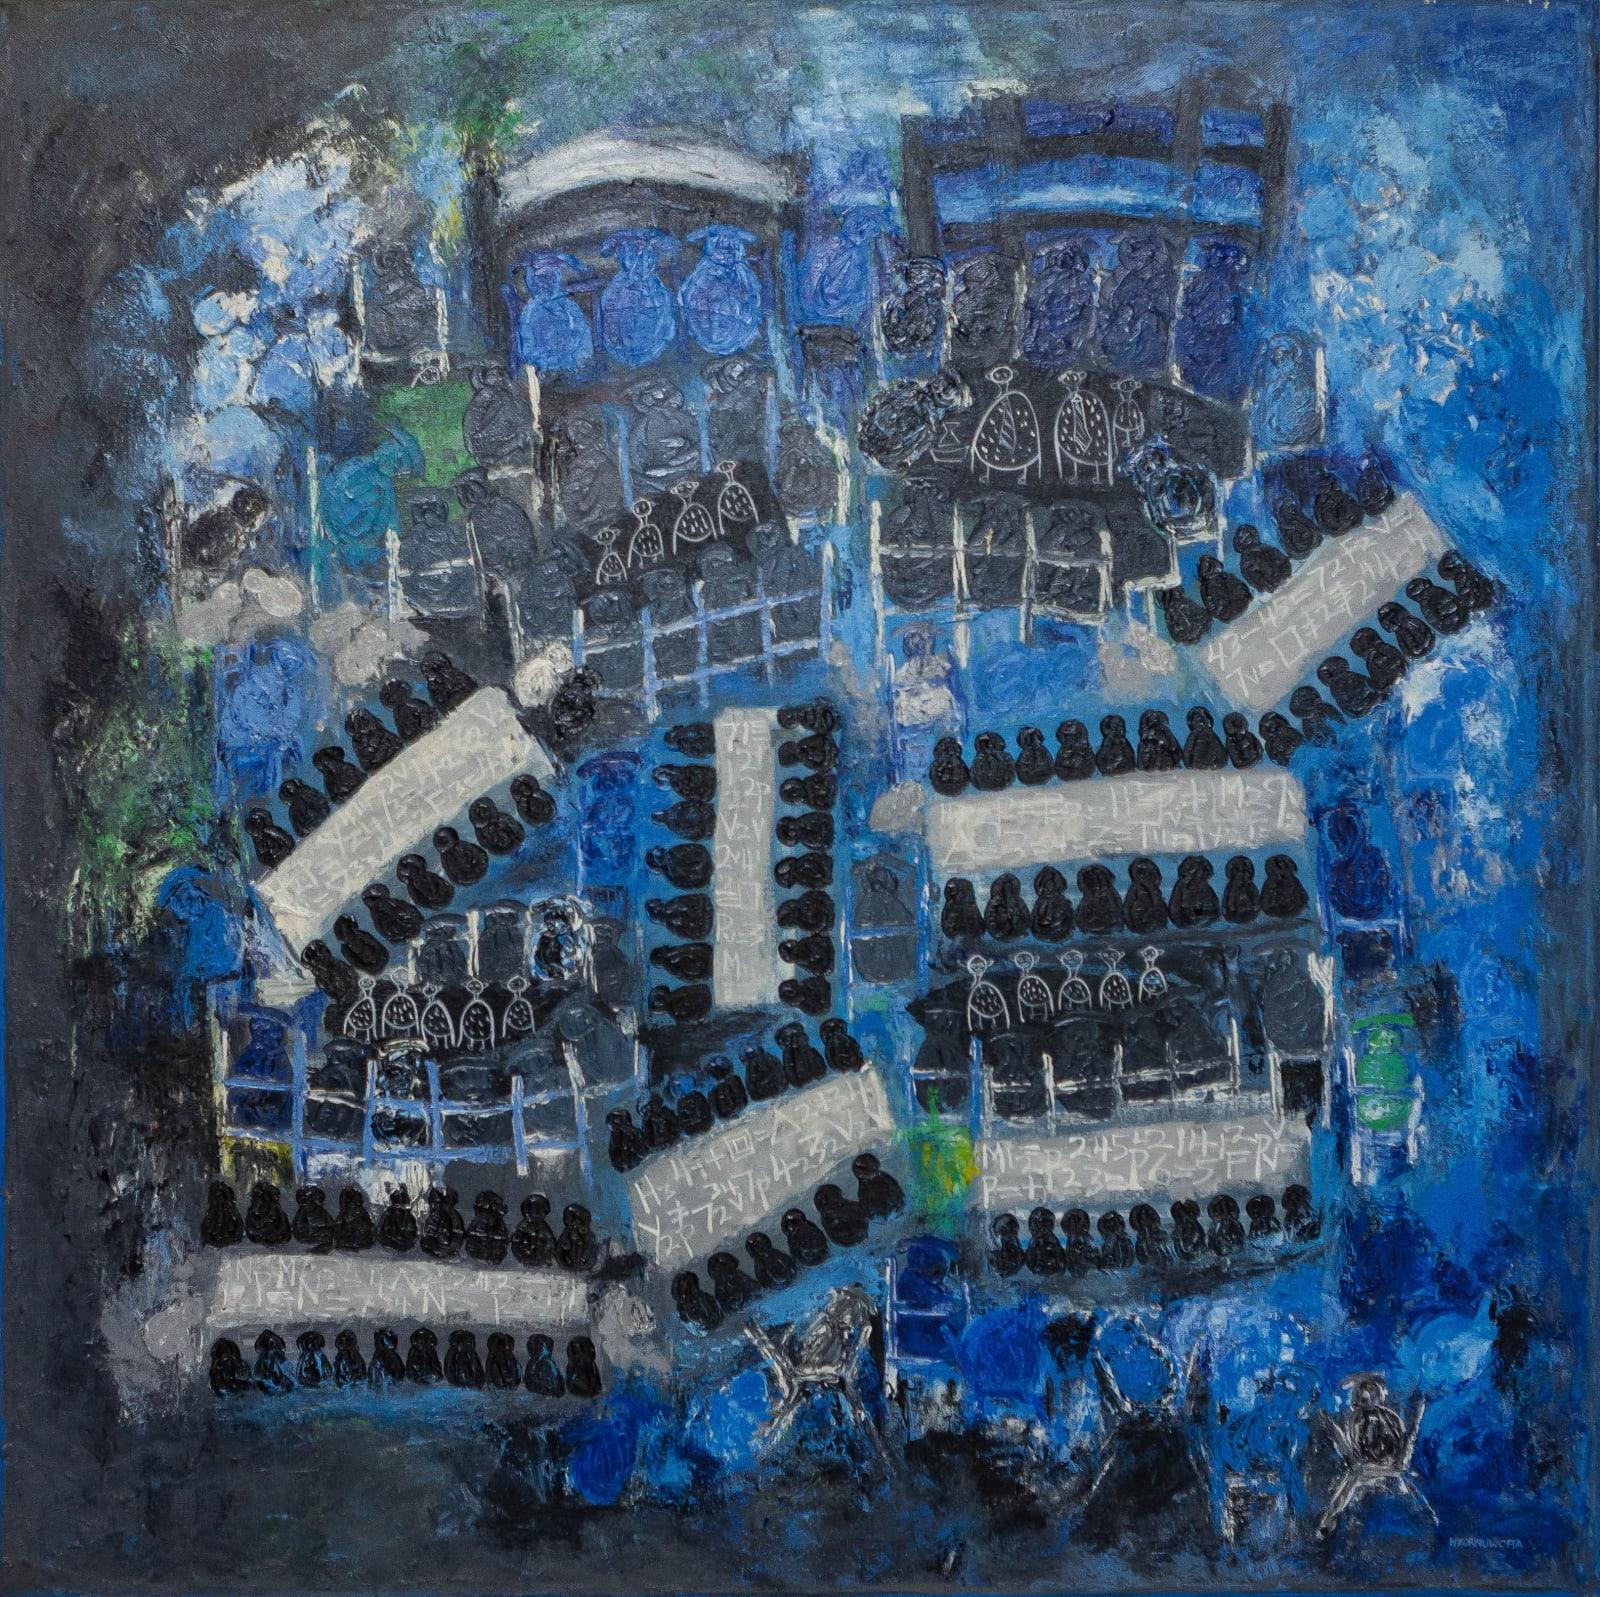 Nyornuwofia Agorsor Higher discussion (2015) 120 x 120 cm Acrylic on canvas